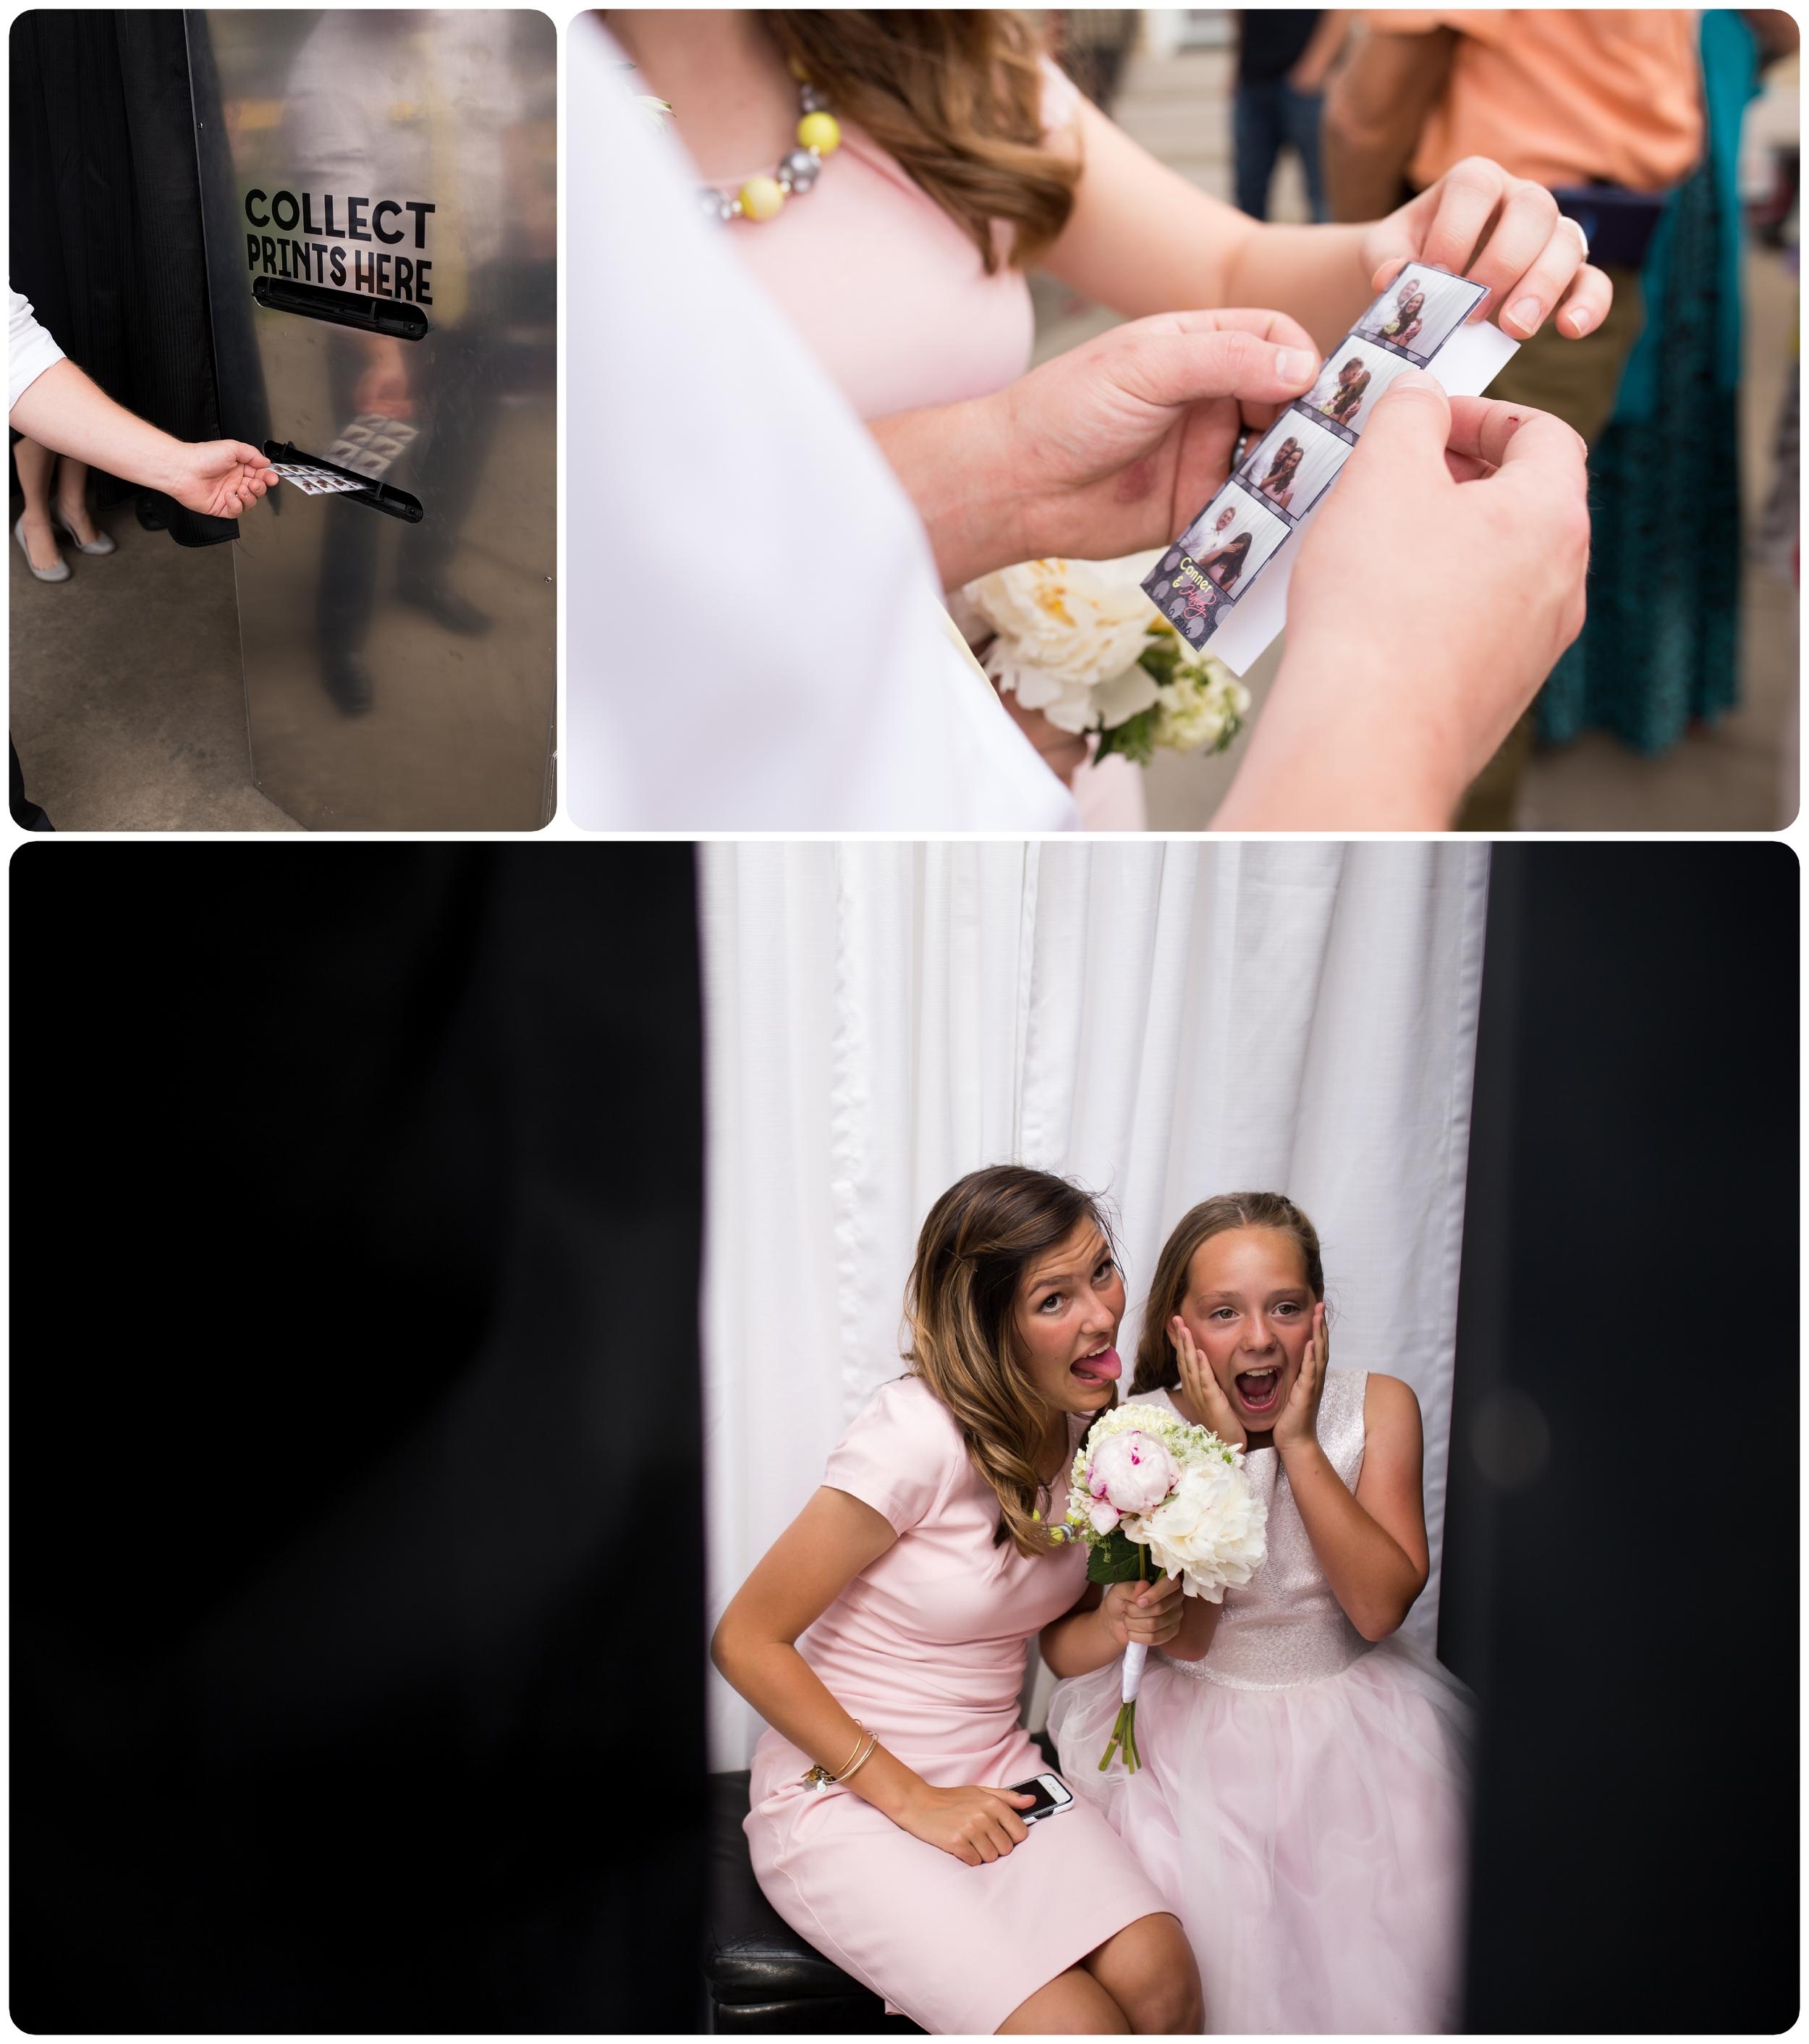 Rachel Lindsey Photography | Salt Lake City, UT | Engagements & Wedding Photographer